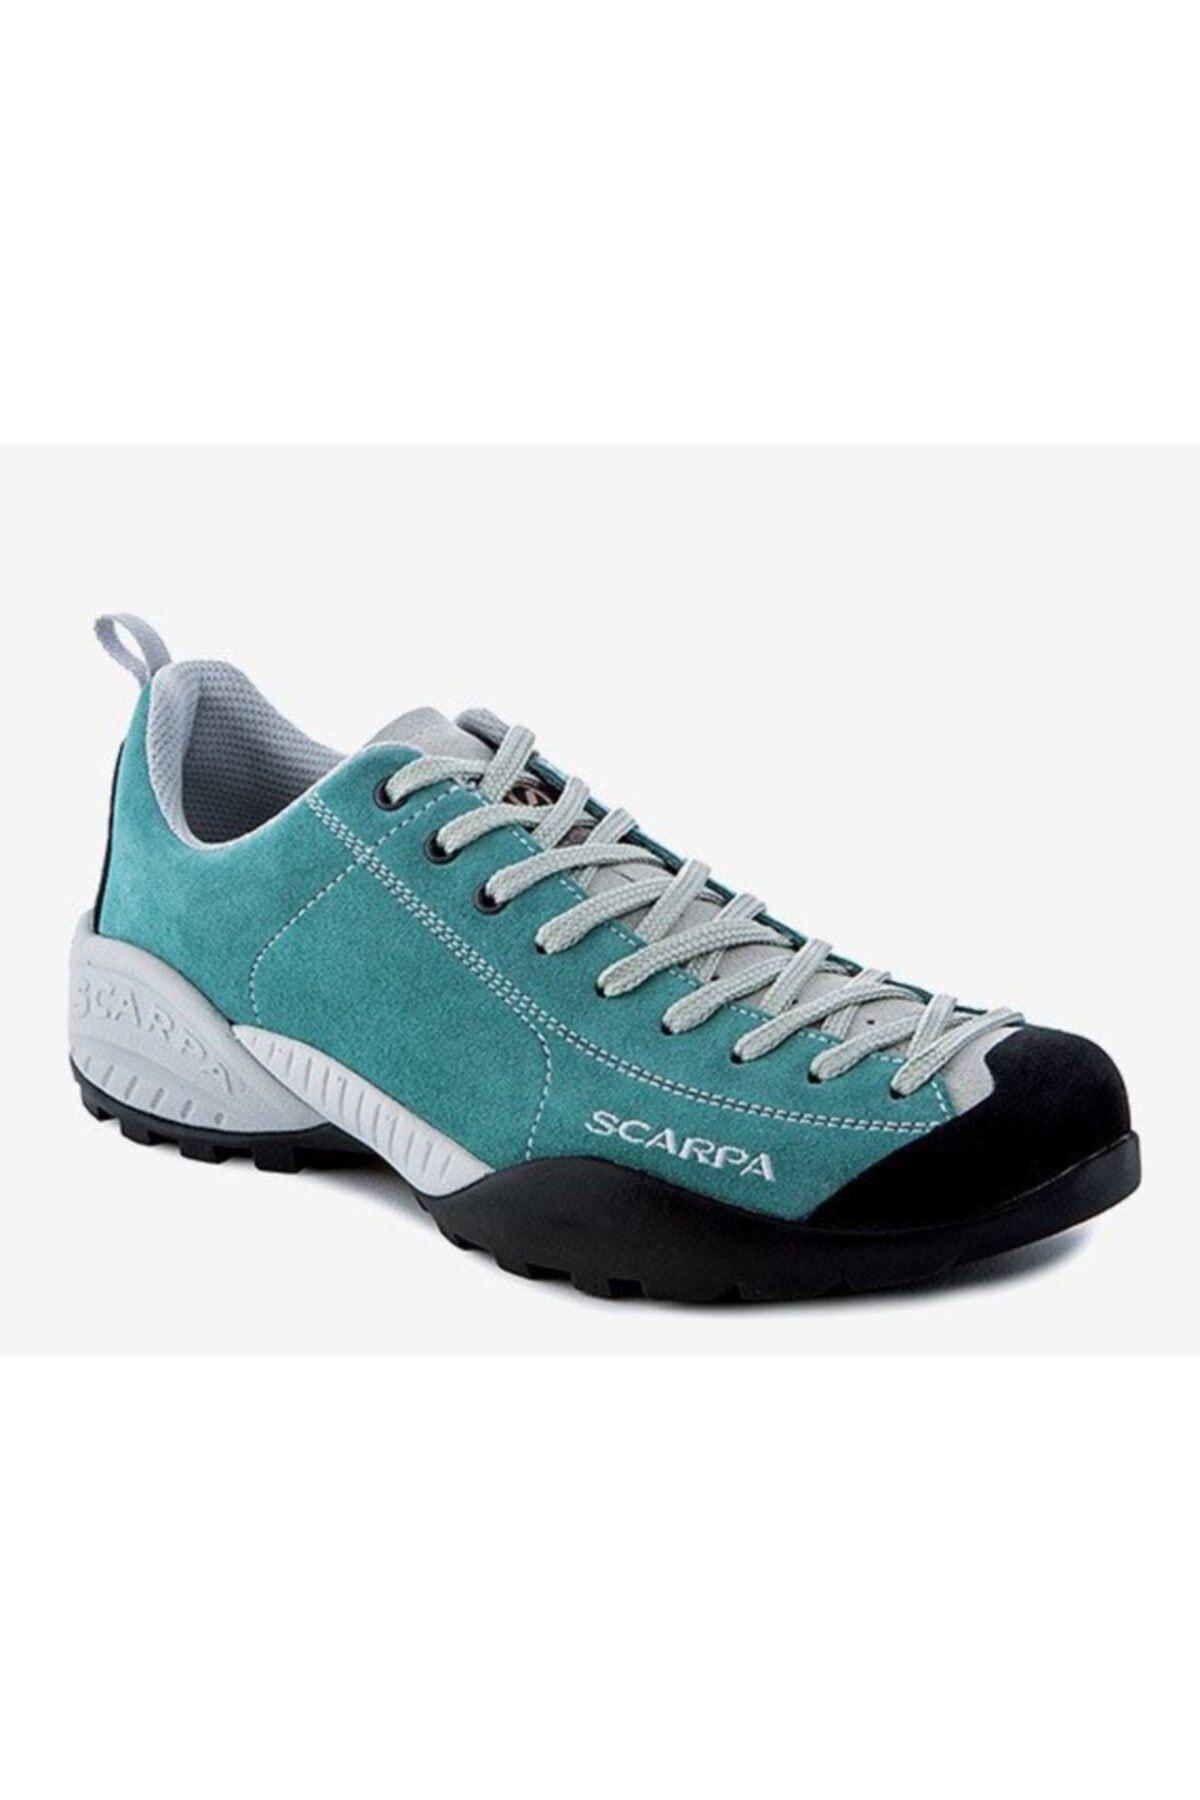 کفش کوهنوردی مردانه کوتاه برند Scarpa رنگ نارنجی کد ty37027239